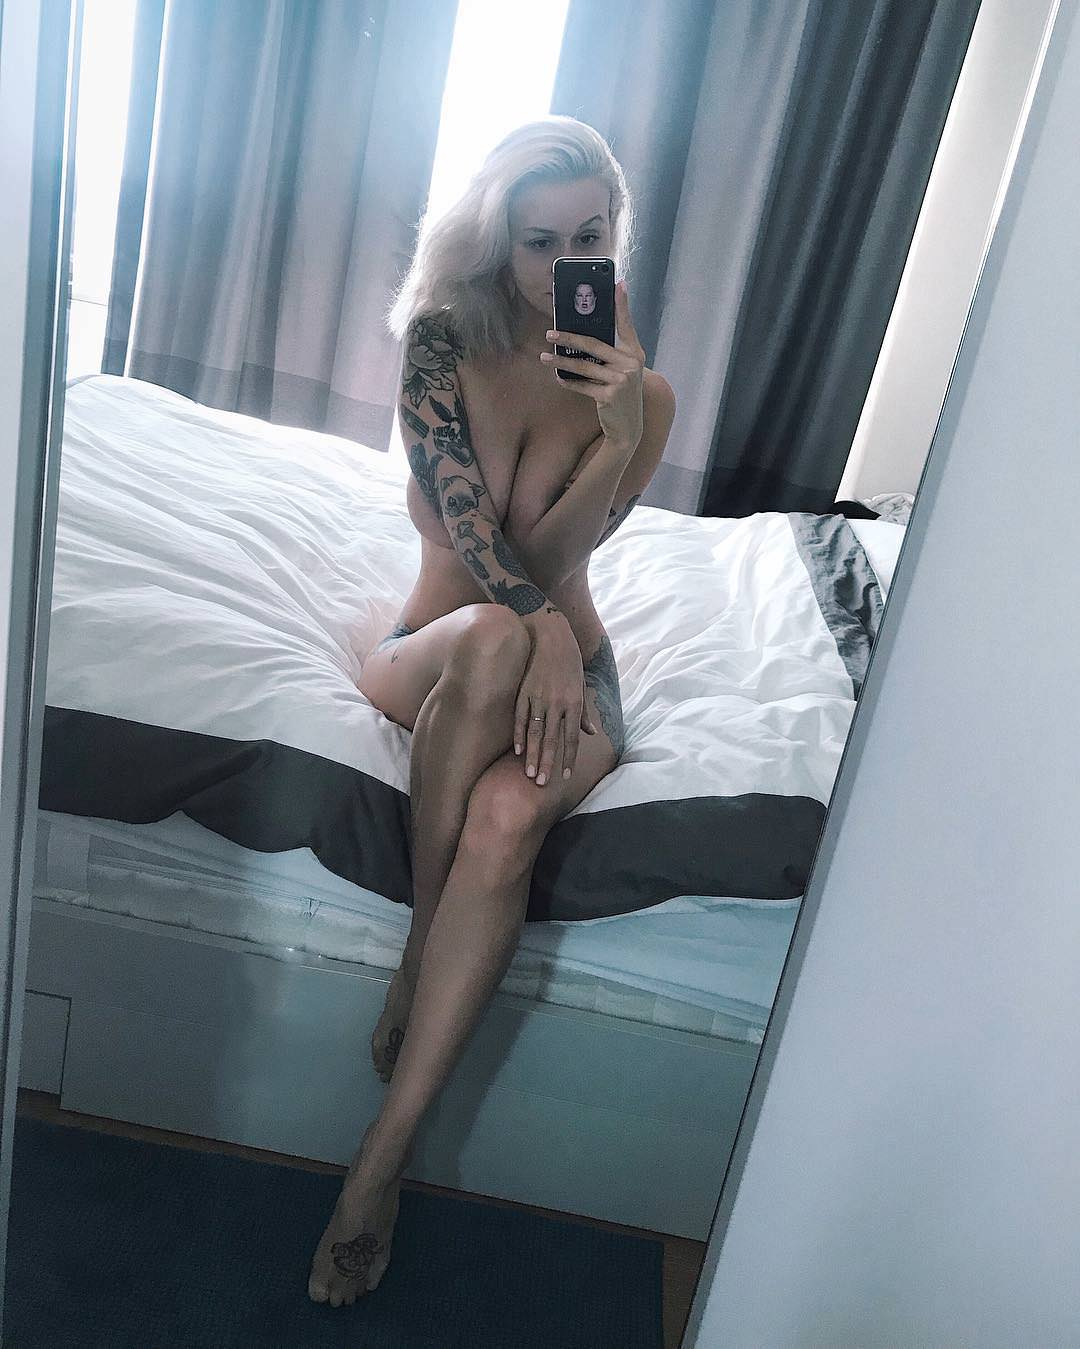 Peliculas Porno De Mirie Mooror revealing and tasteful porn photo - eporner